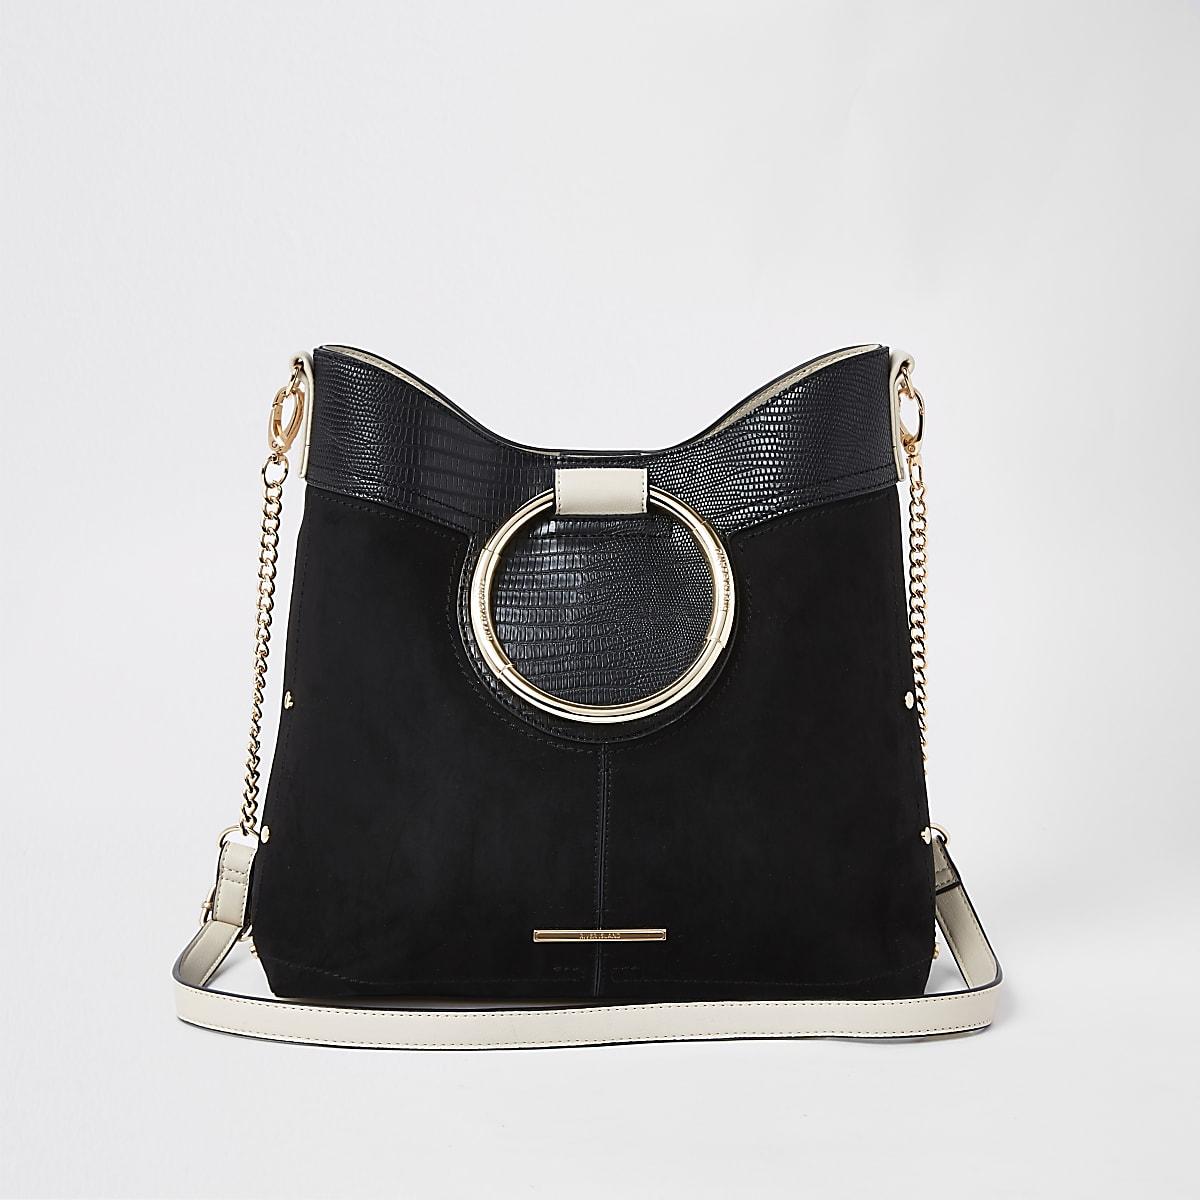 Black ring handle bucket bag